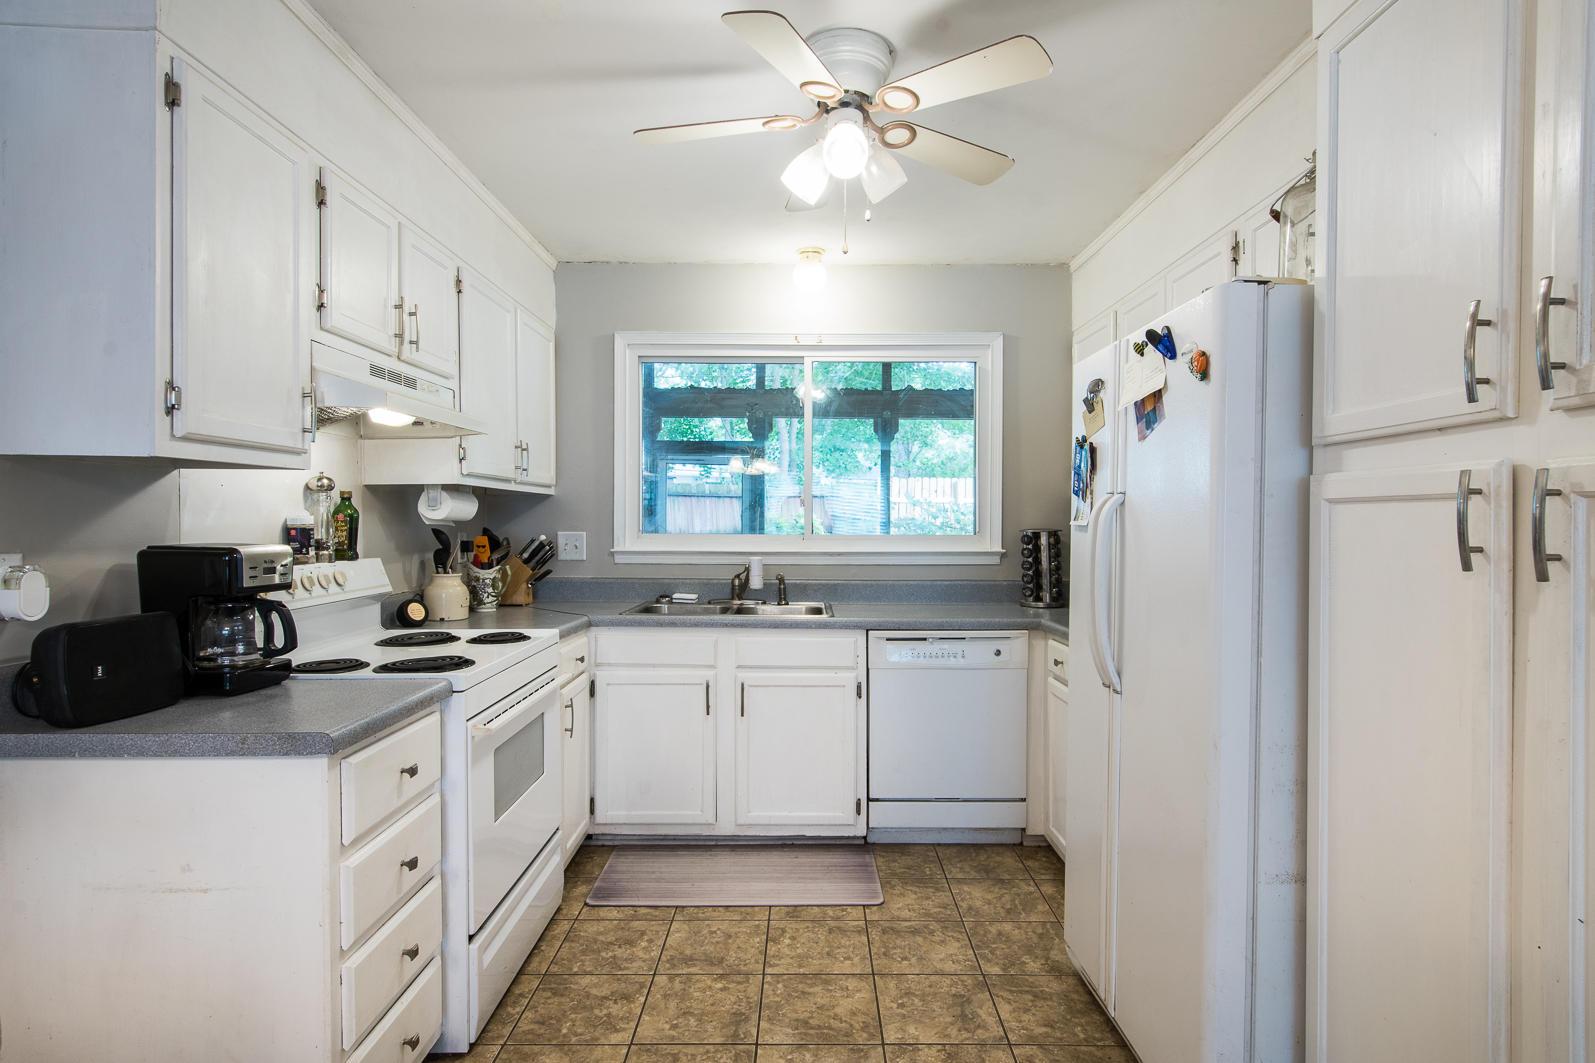 Wando East Homes For Sale - 1605 Babington, Mount Pleasant, SC - 24